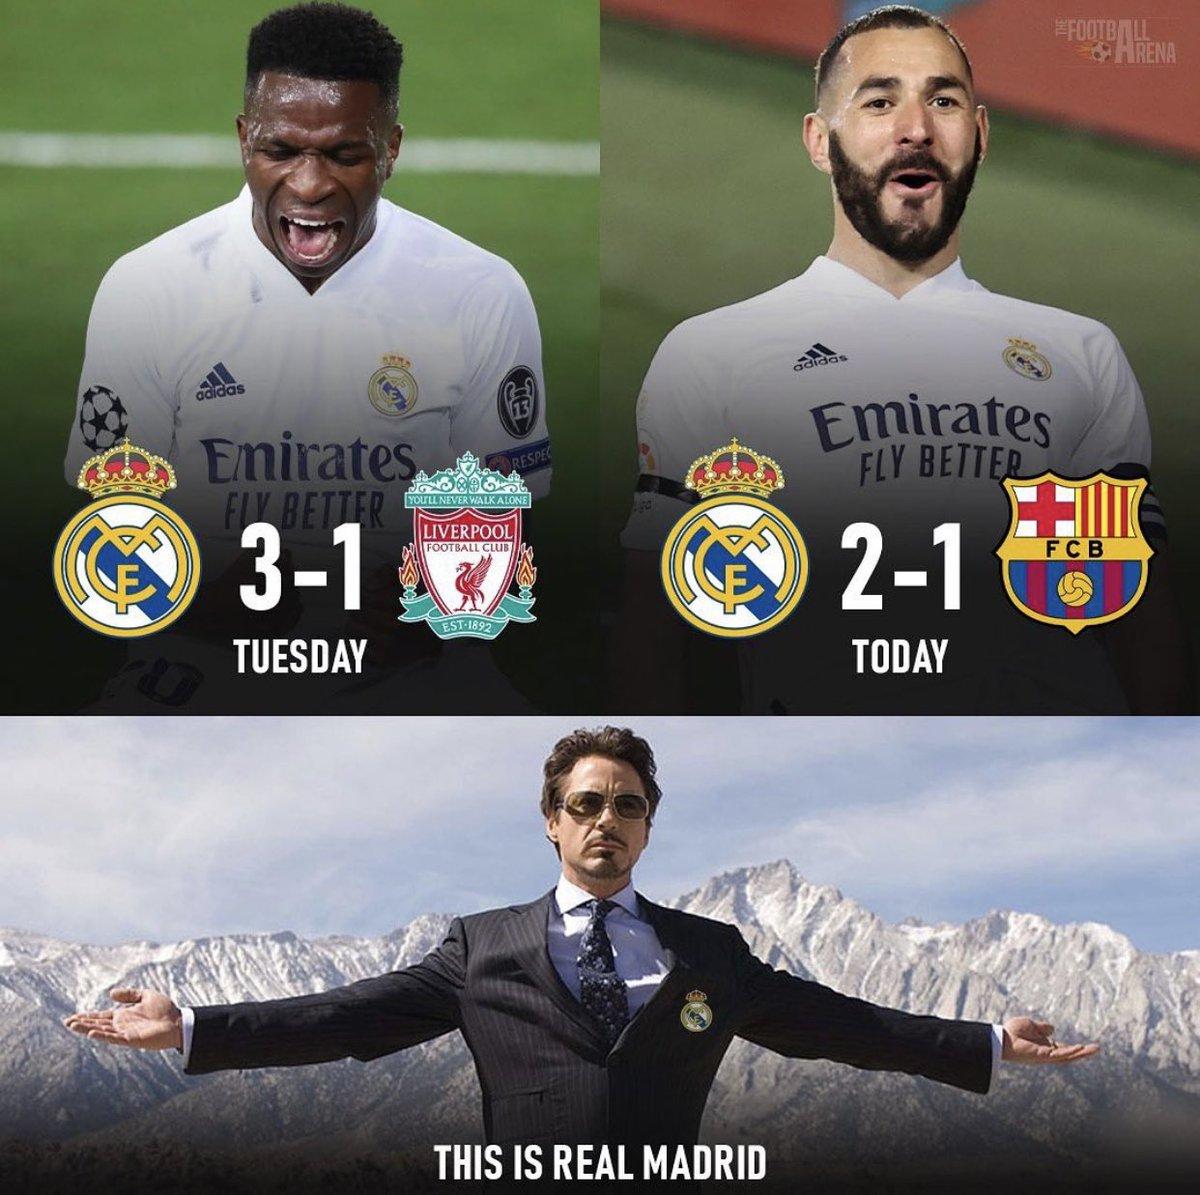 @Blue02892362's photo on Real Madrid